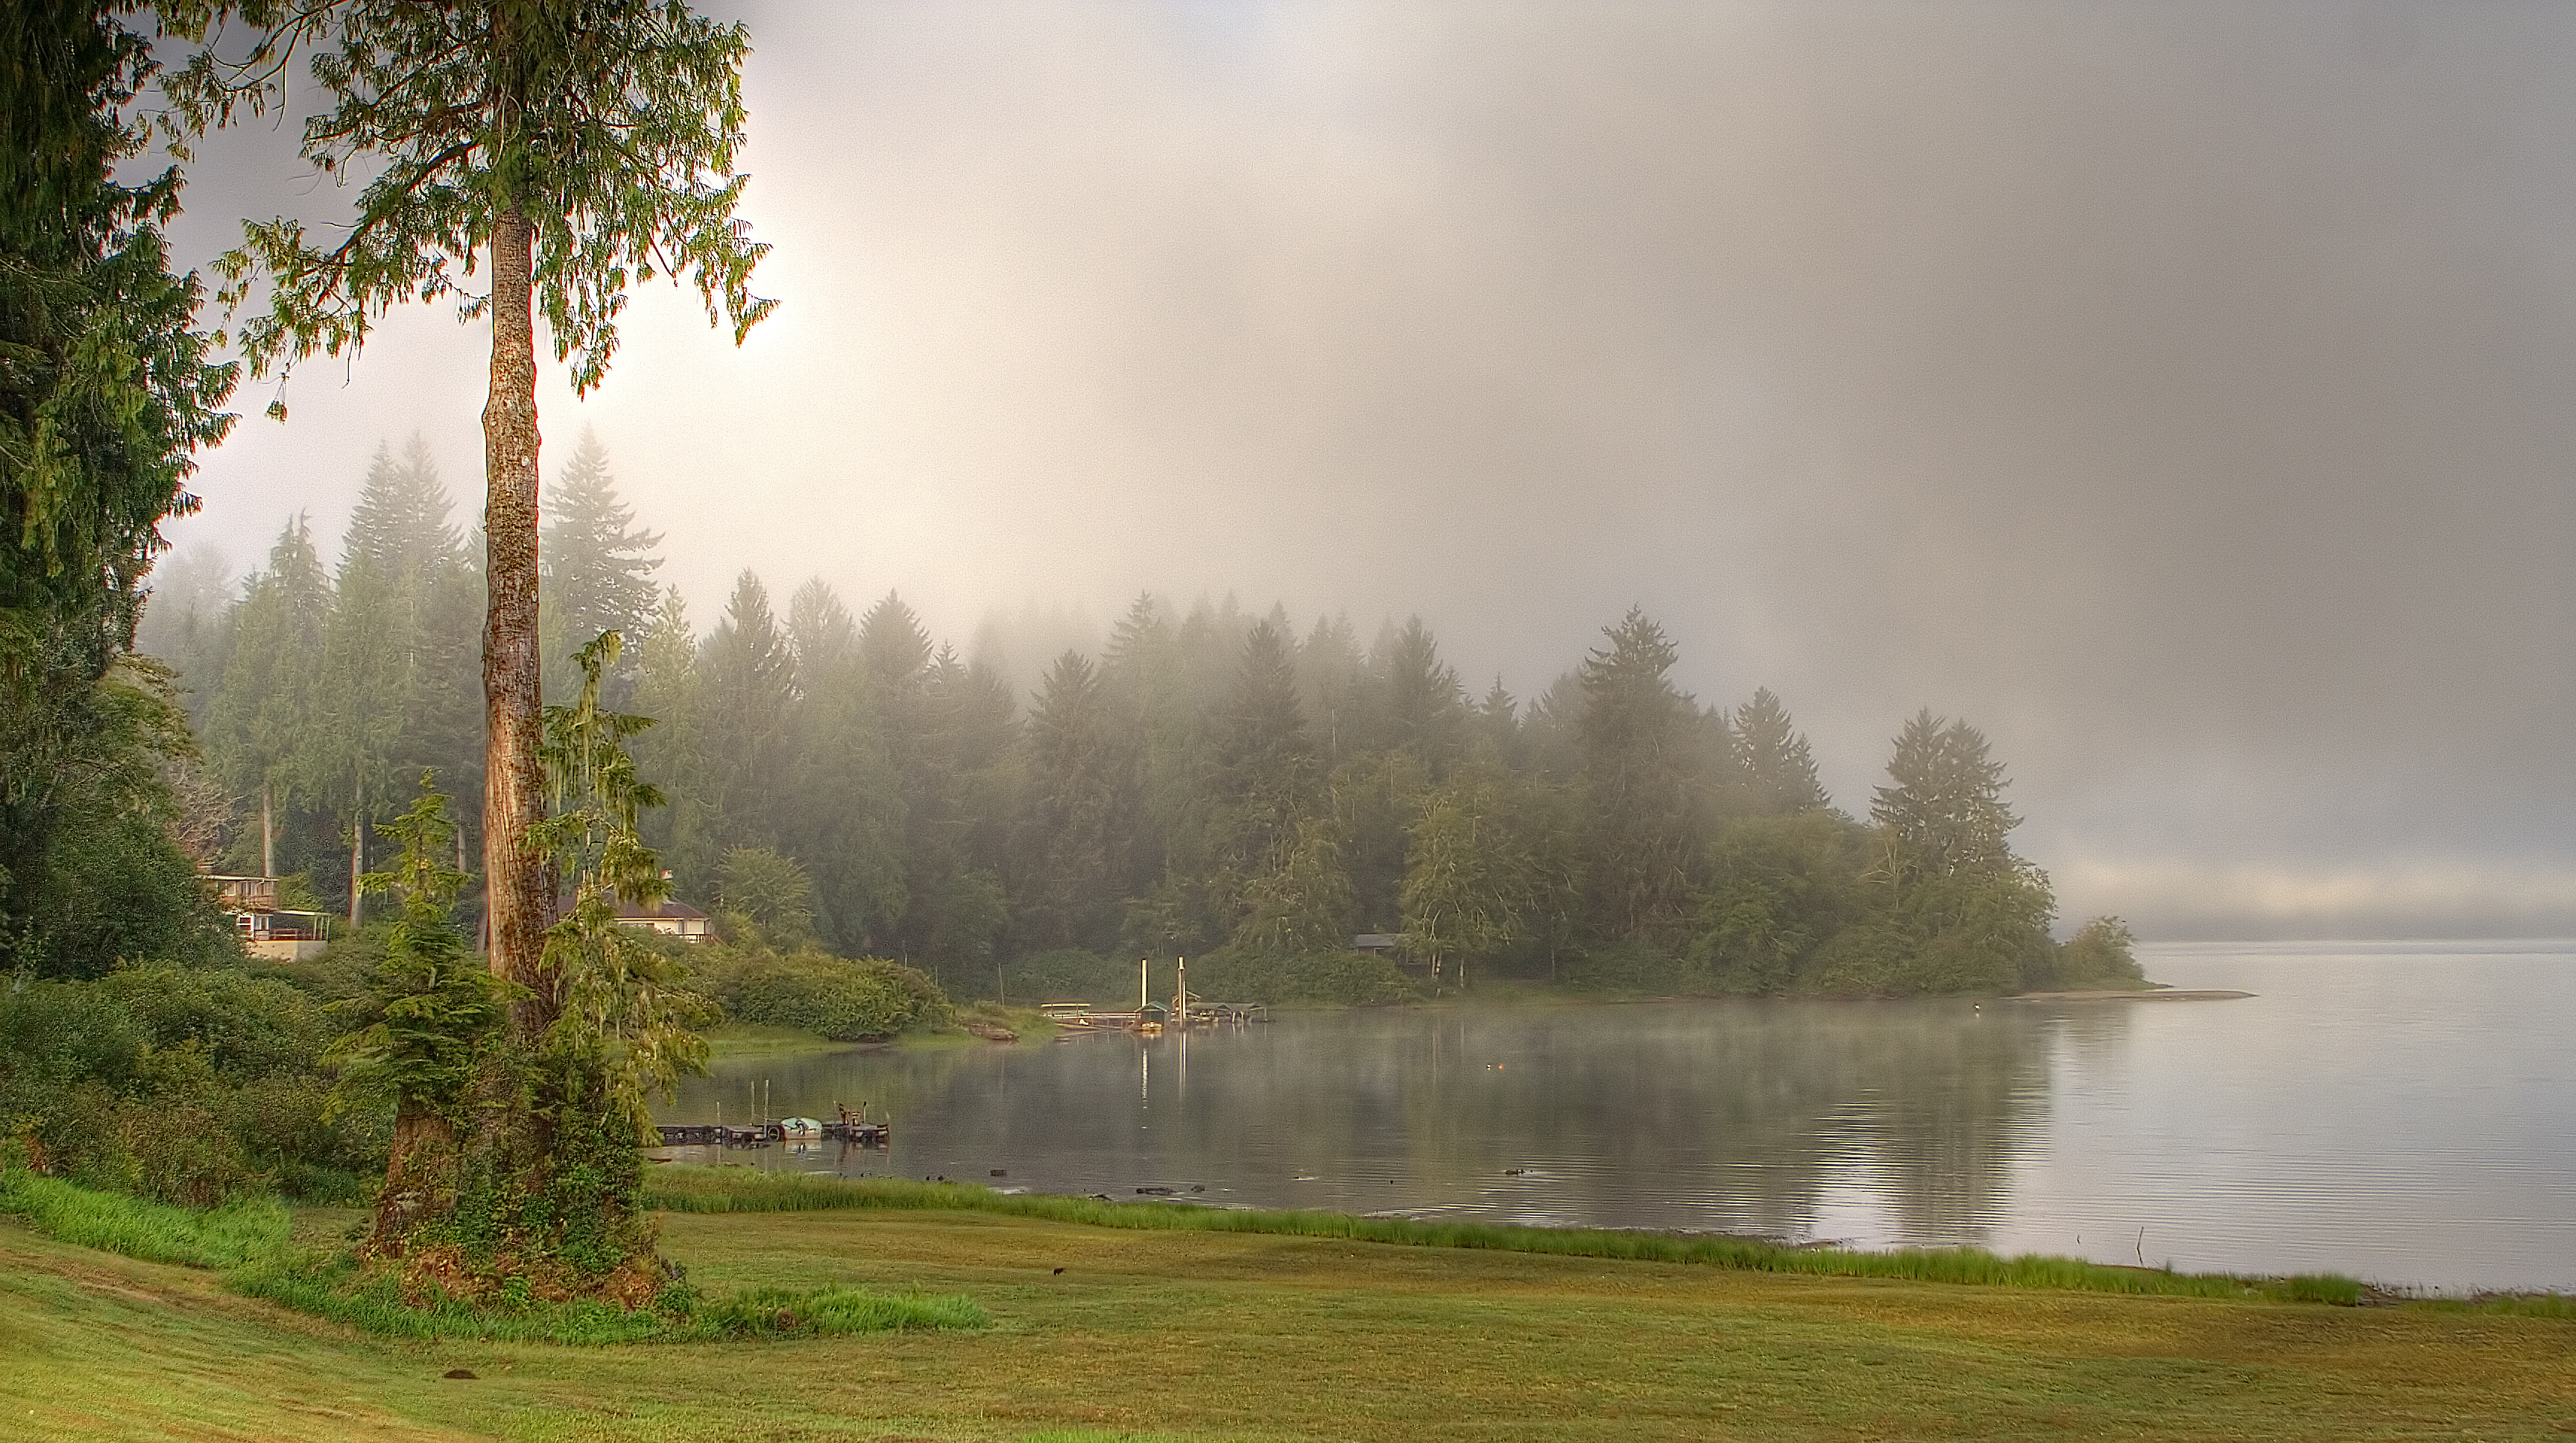 File:Lake Quinault - Misty Morning - Flickr - rachel ...